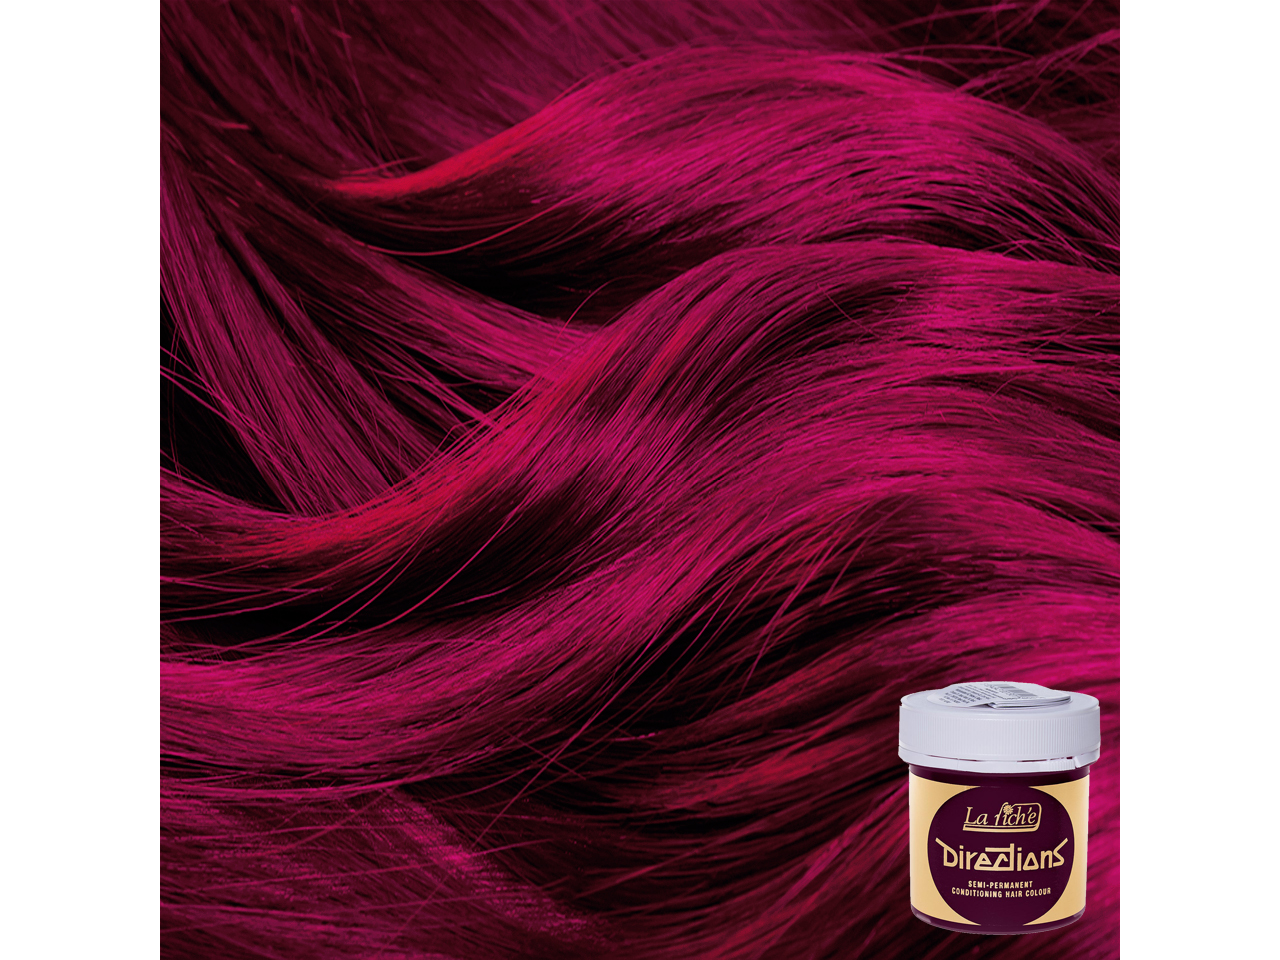 La Riche Directions Dark Tulip Hair Dye